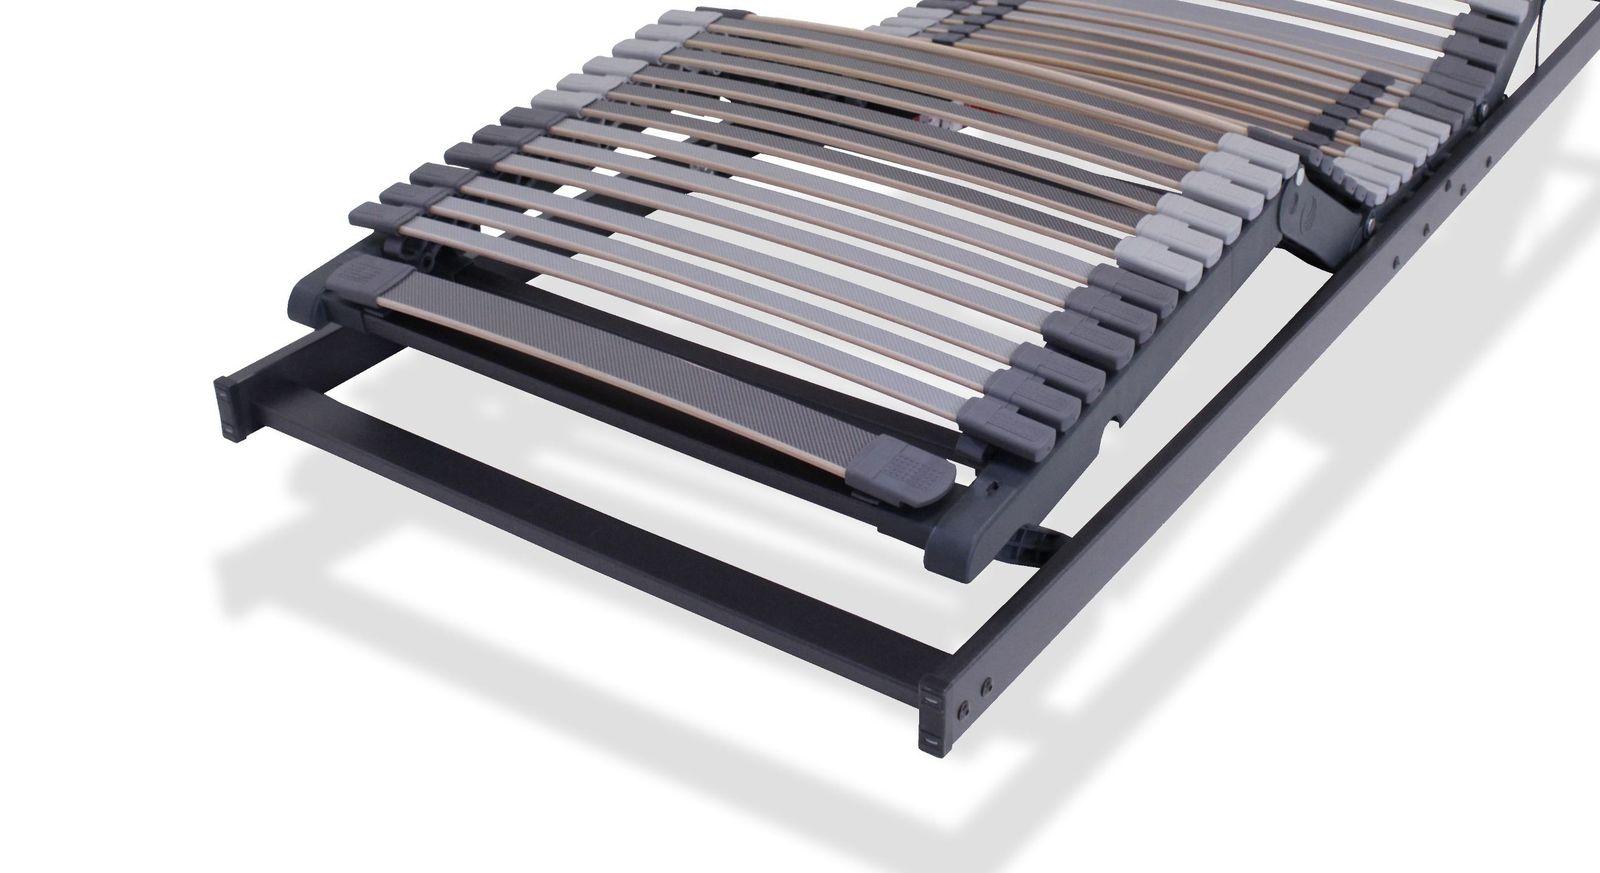 Lattenrost orthowell ultraflex motor mit optimaler Anpassung